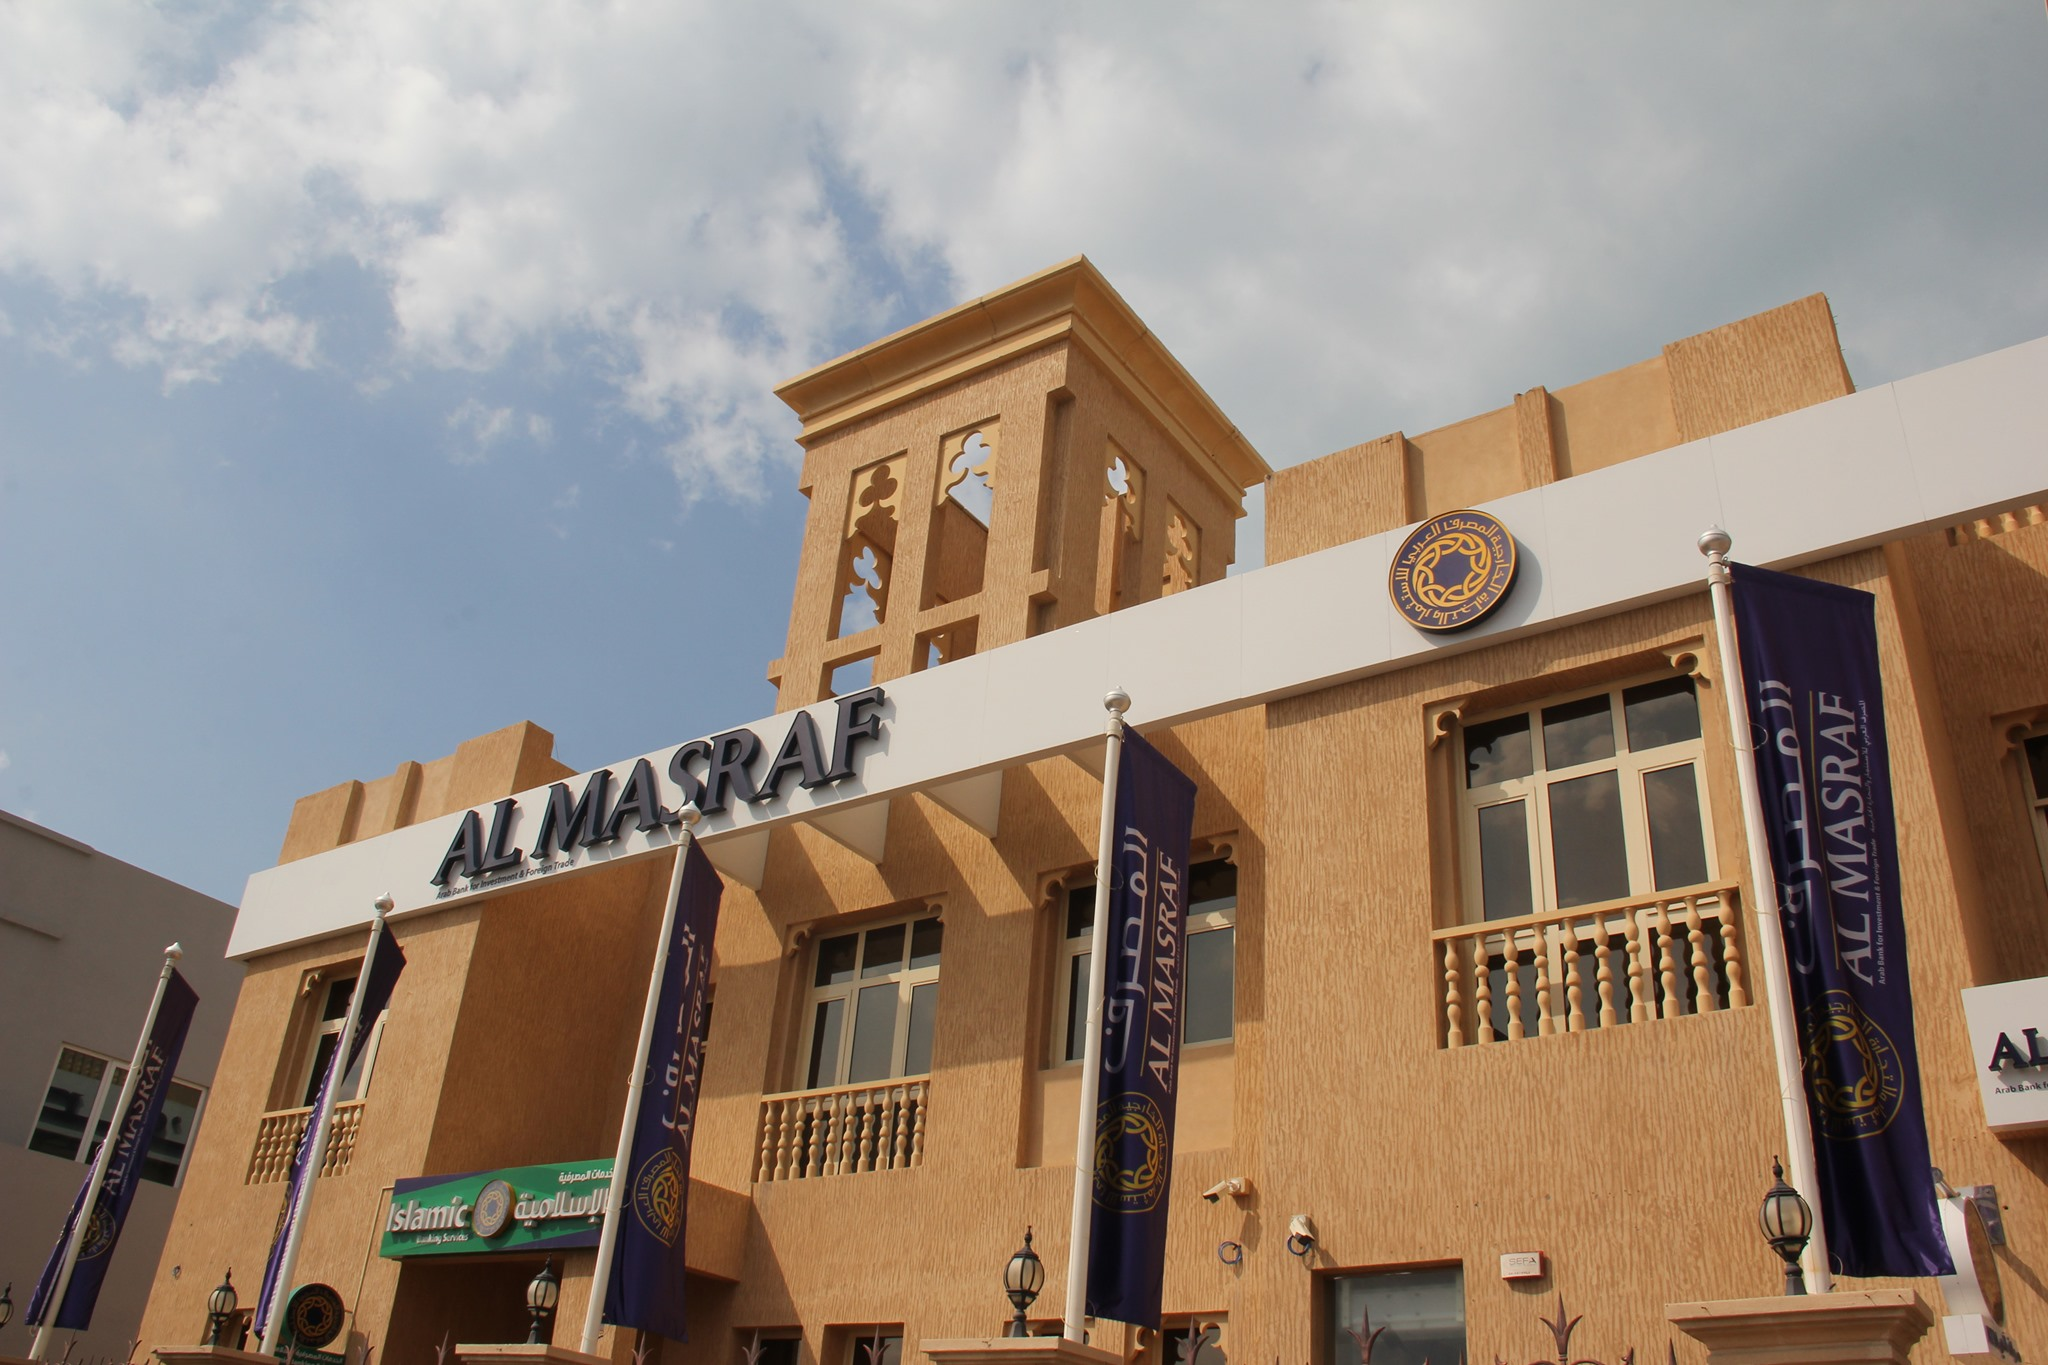 Al Masraf - Jumeirah Branch